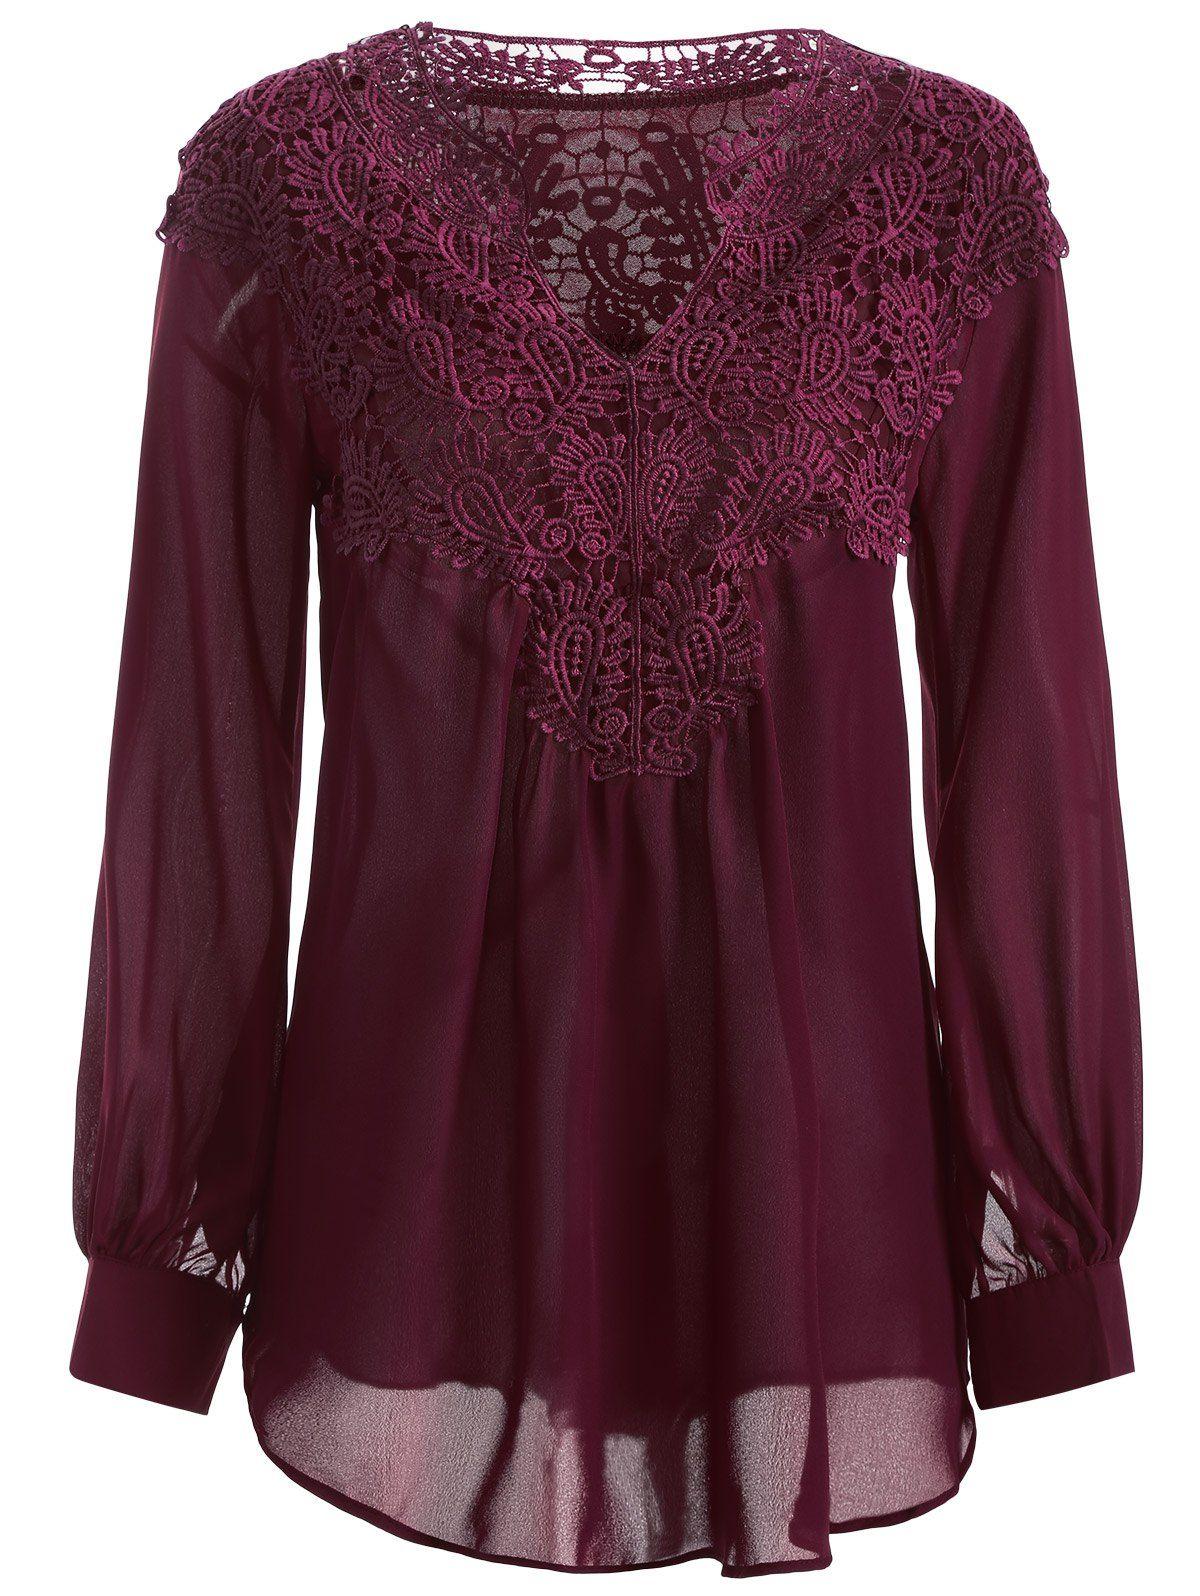 399e0017c51 Long Sleeve Crochet Detail Blouse - WINE RED XL Long Sleeve Shirts, Lace  Tunic,